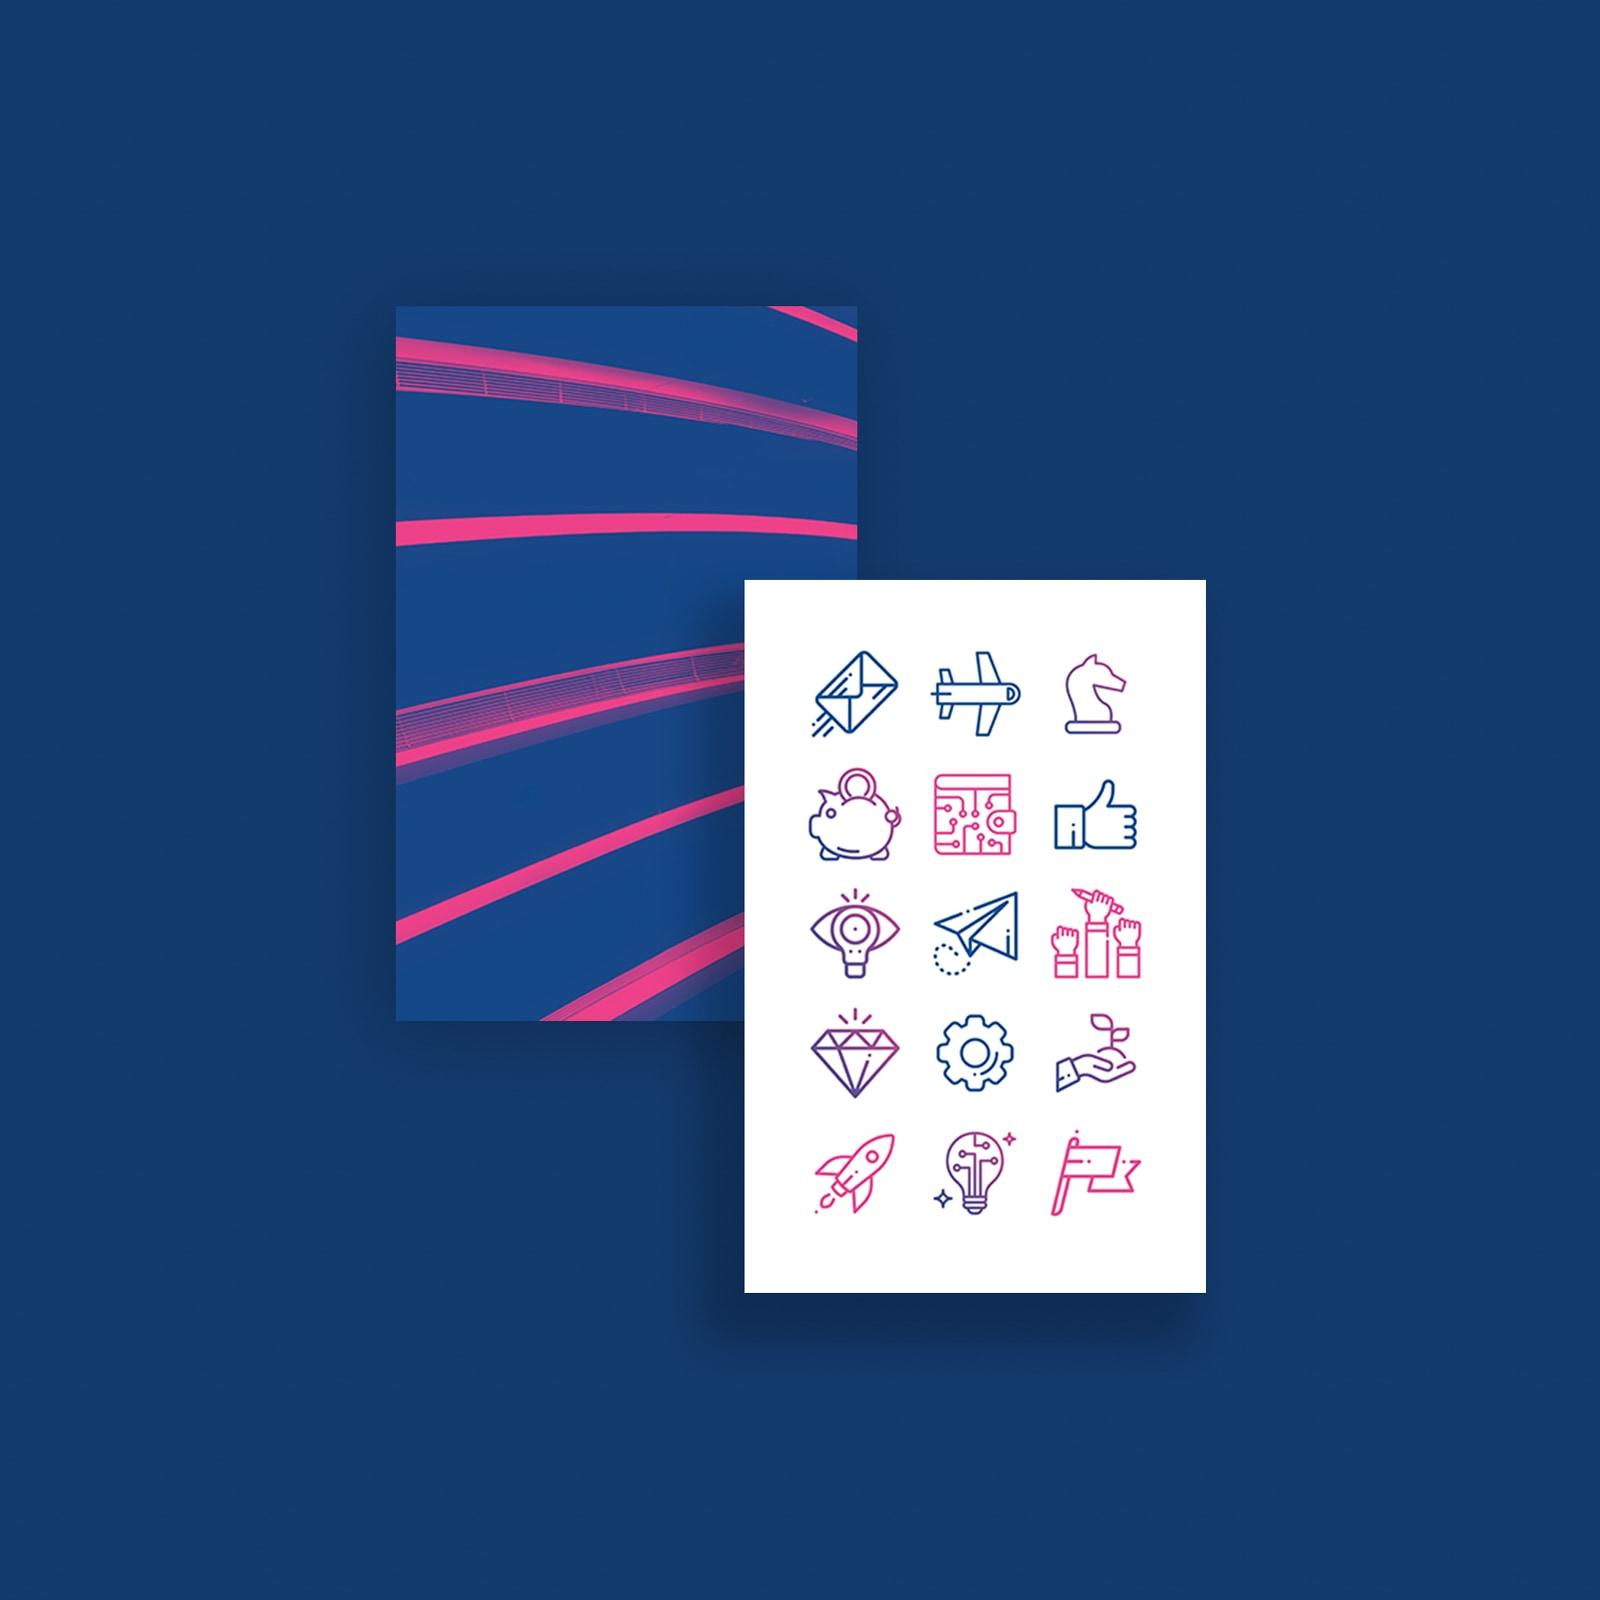 malvina-alves-graphic-design-artefact